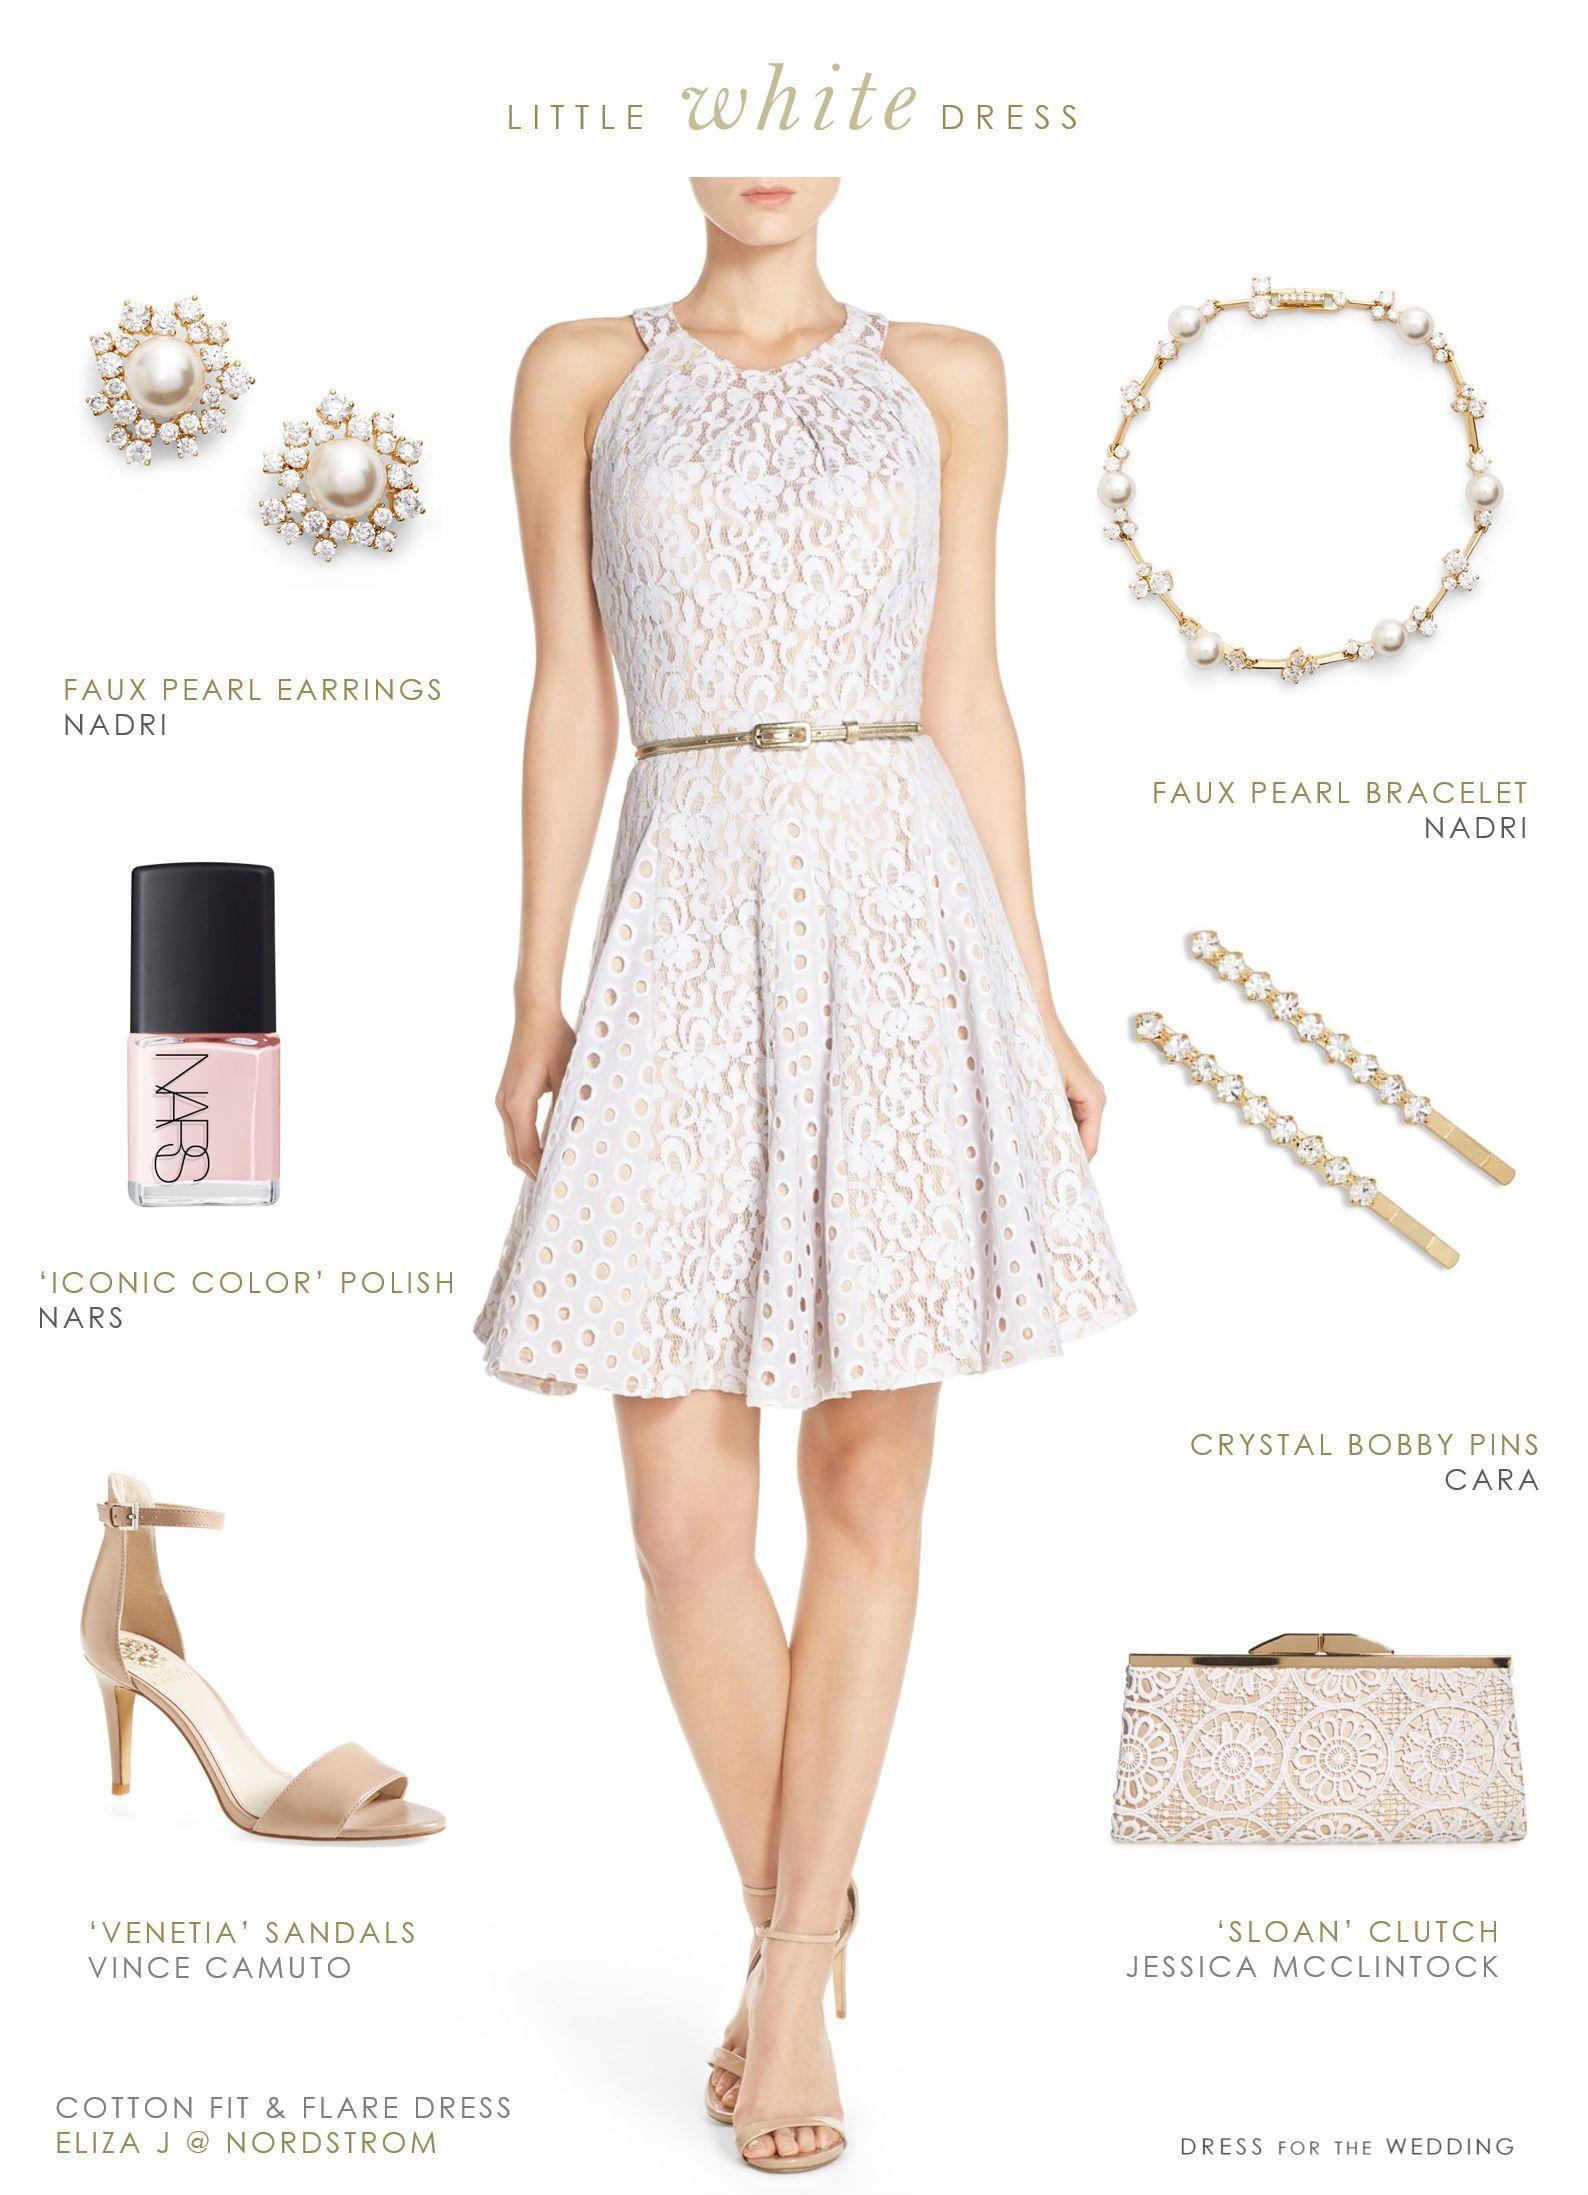 White Dress For A Bridal Shower Cute White Dresses For Weddings Cute White Dress White Bridal Shower Dress Little White Dresses [ 2195 x 1588 Pixel ]